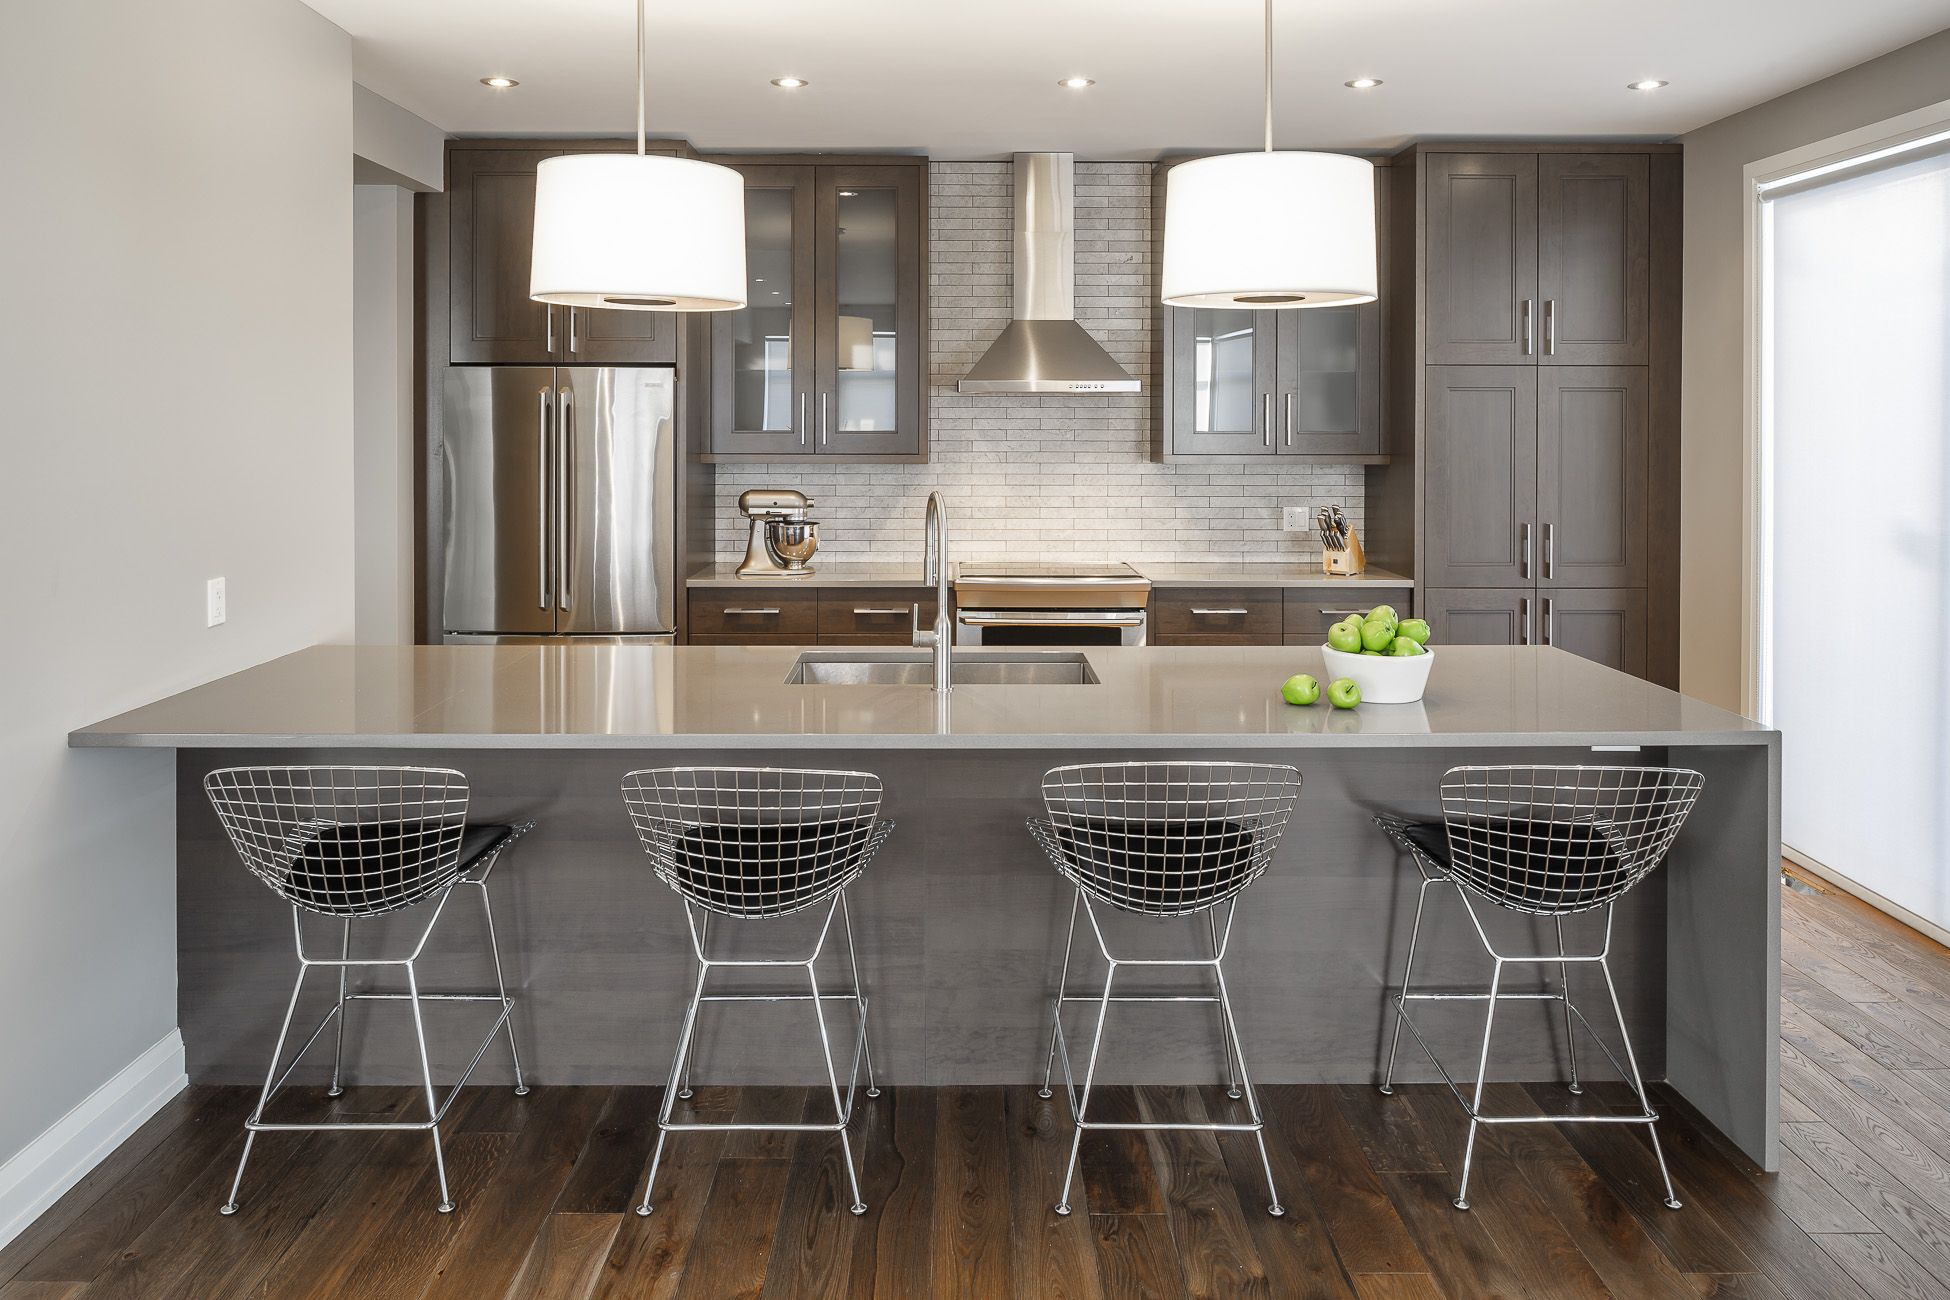 Modern Kitchen Design Design By Astro Design Centre Ottawa Canada Cuisine Darty Amenagement De La Cuisine Cuisine